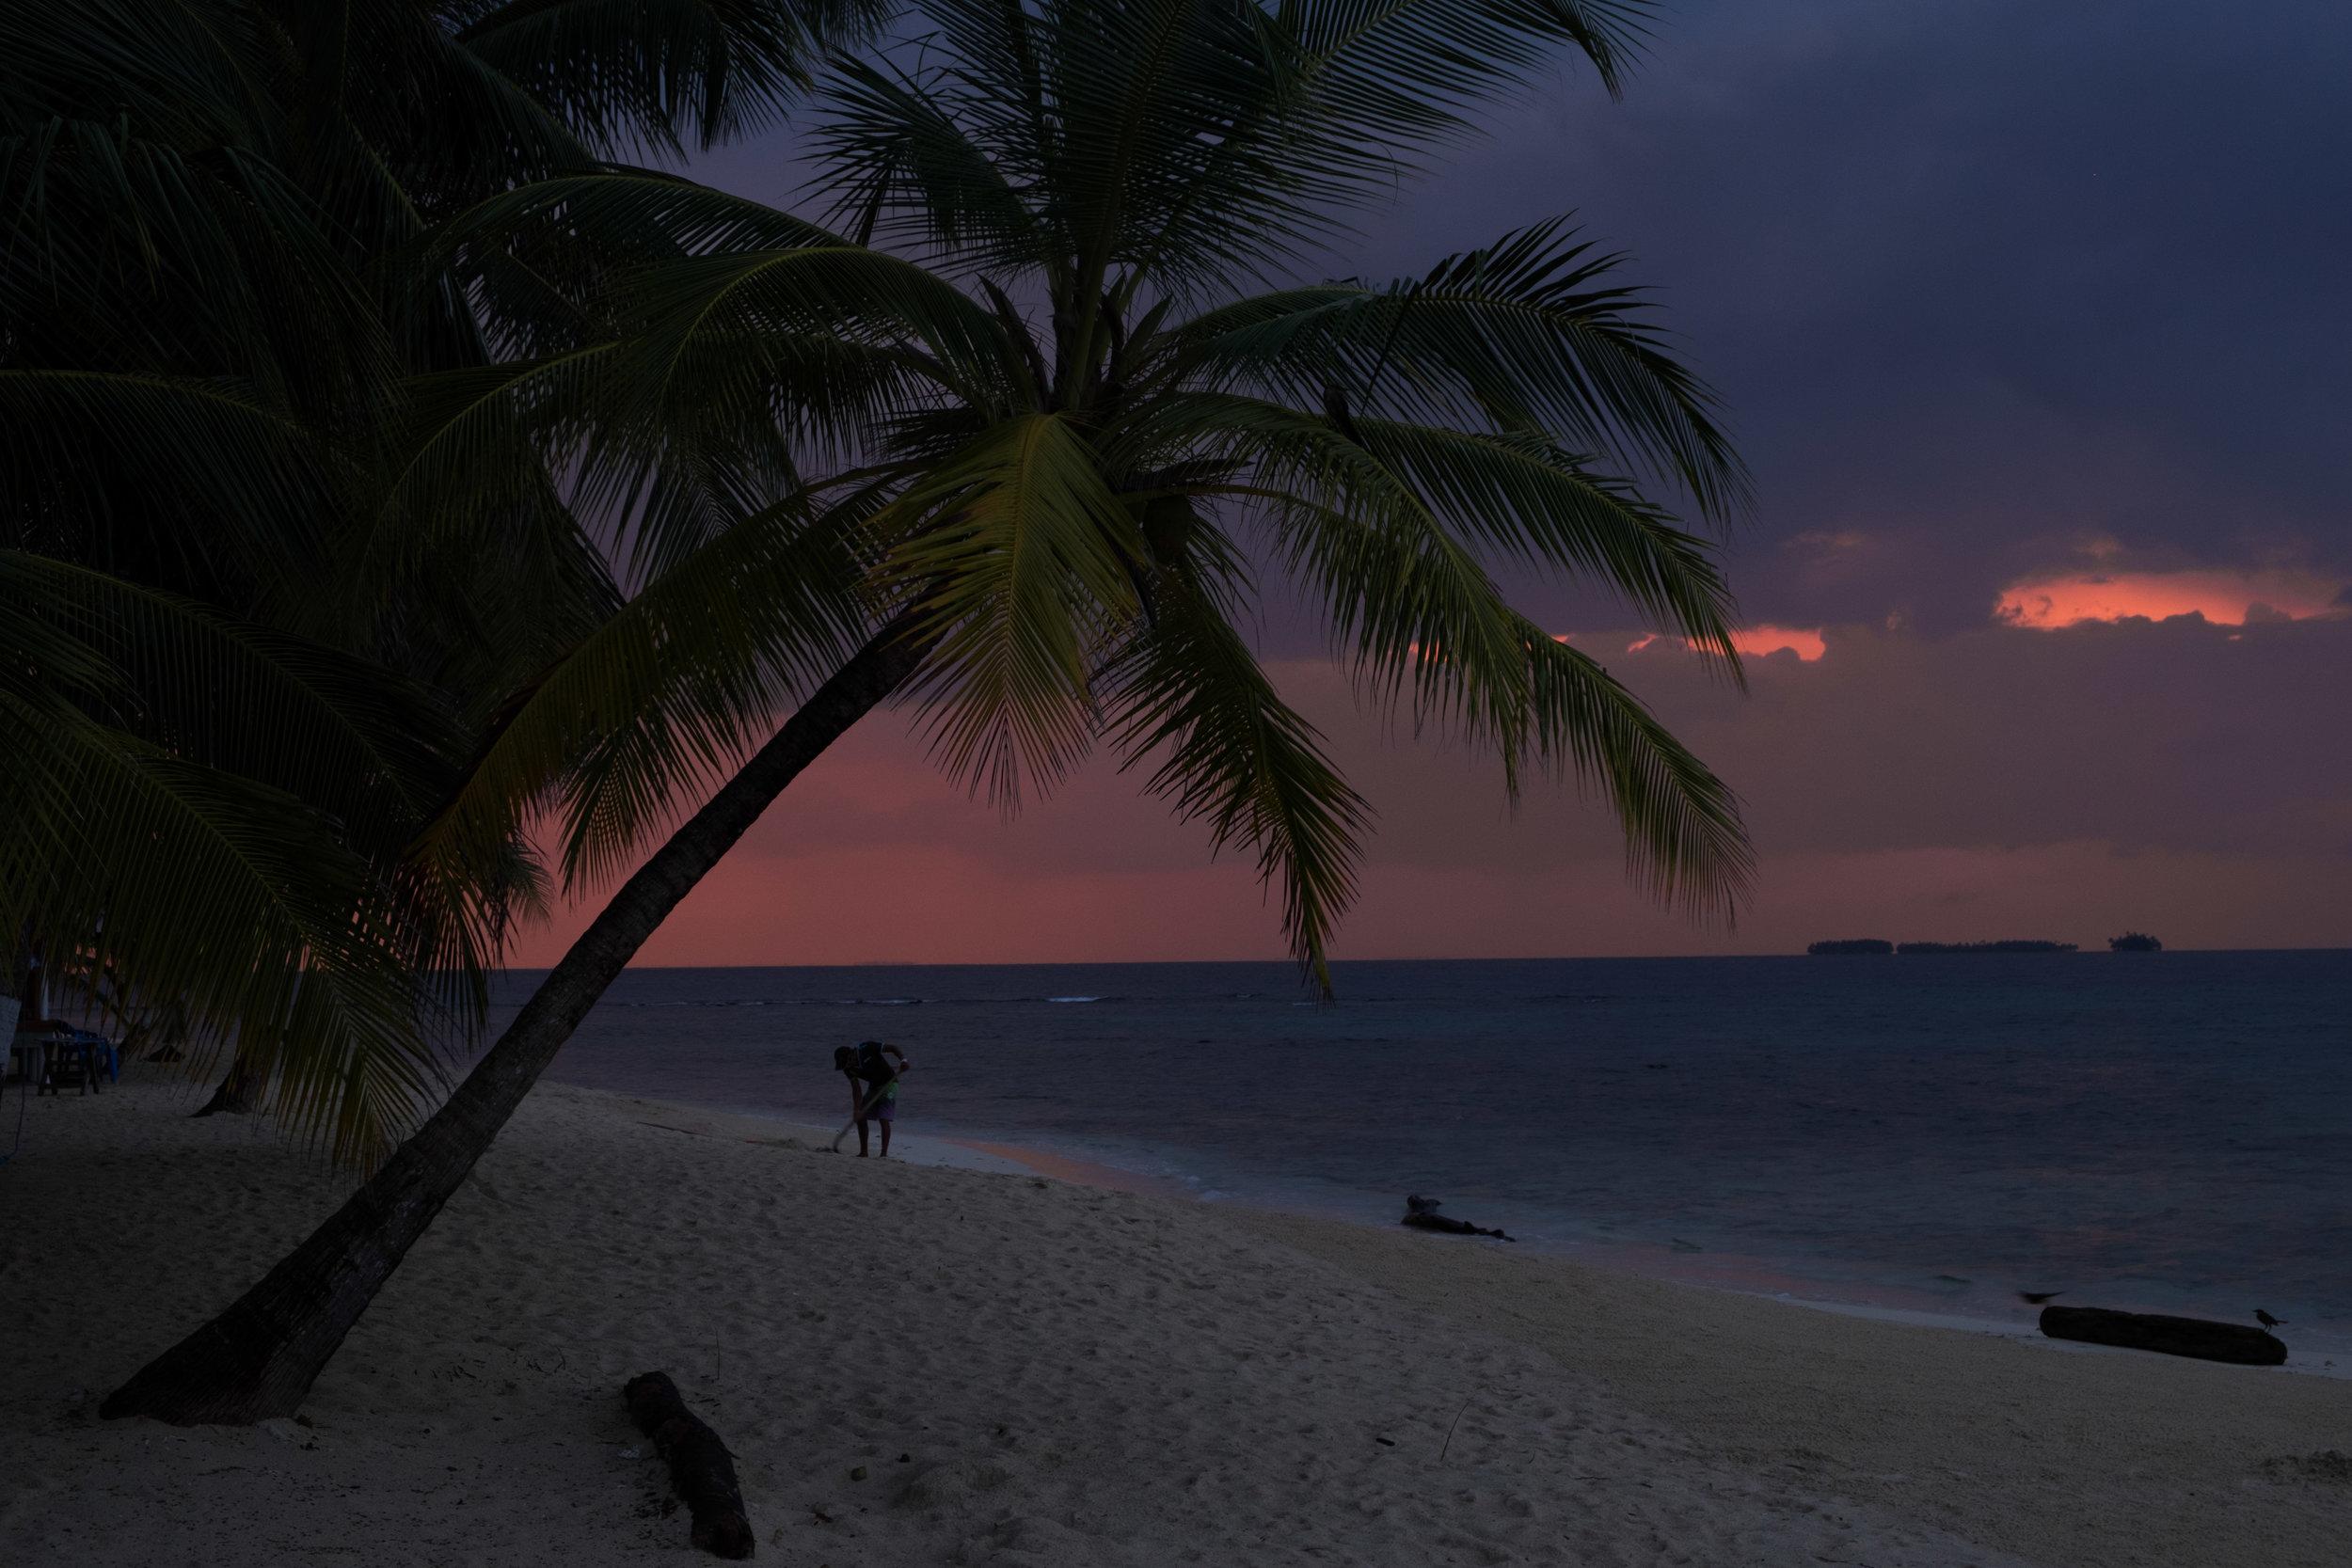 San Blas sunrise, Panama